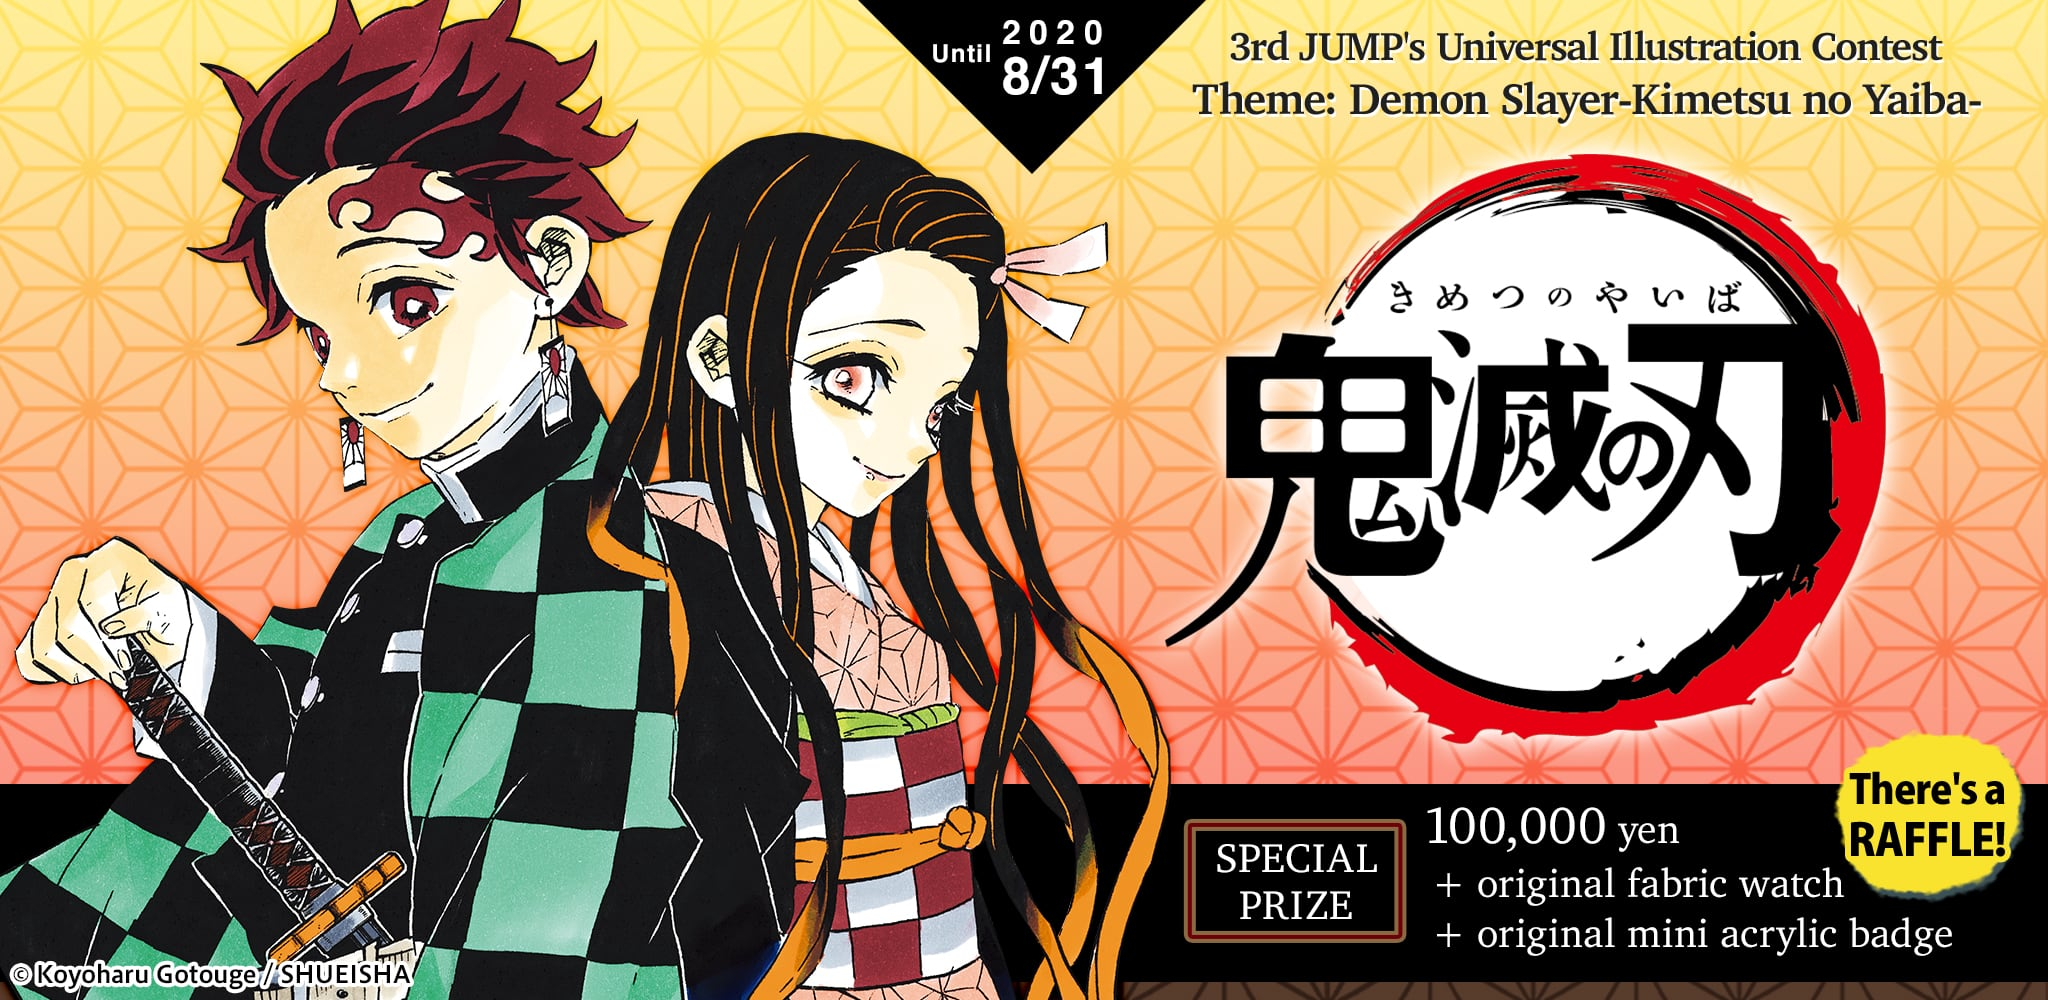 JUMP's 3rd Universal Illustration Contest is now open. Theme: Kimetsu no Yaiba